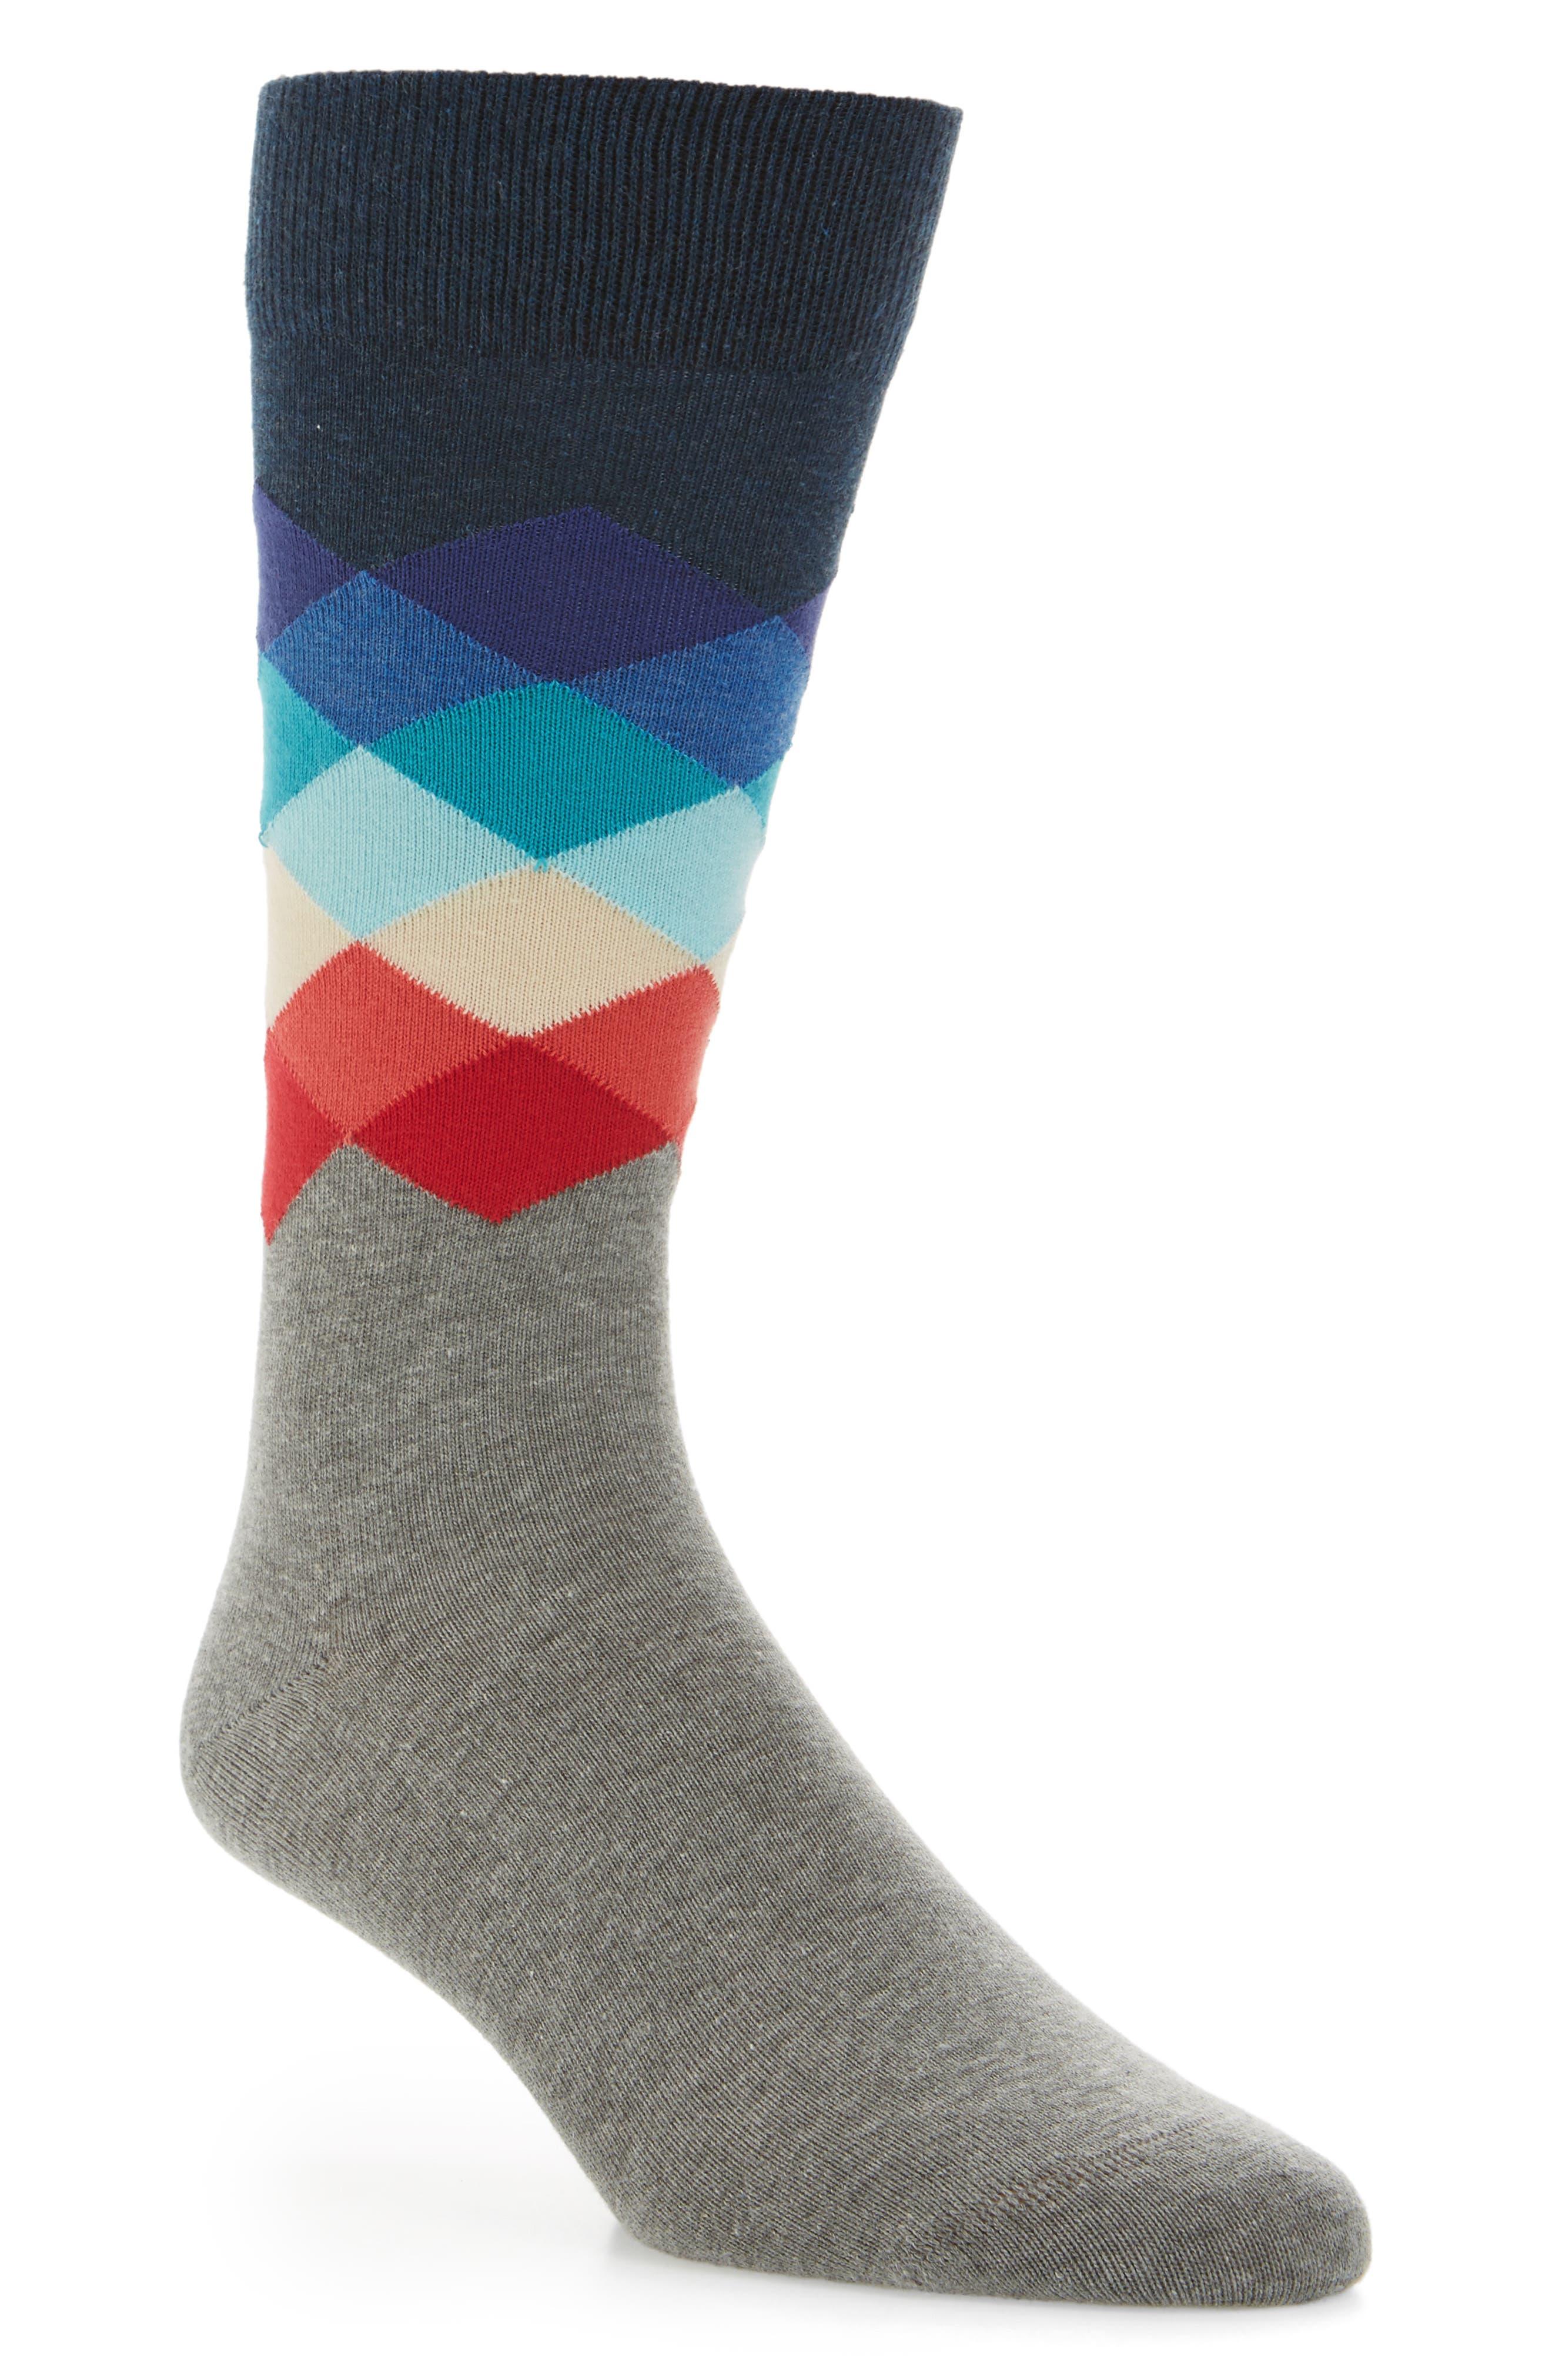 Faded Diamond Socks,                             Main thumbnail 1, color,                             Navy Multi